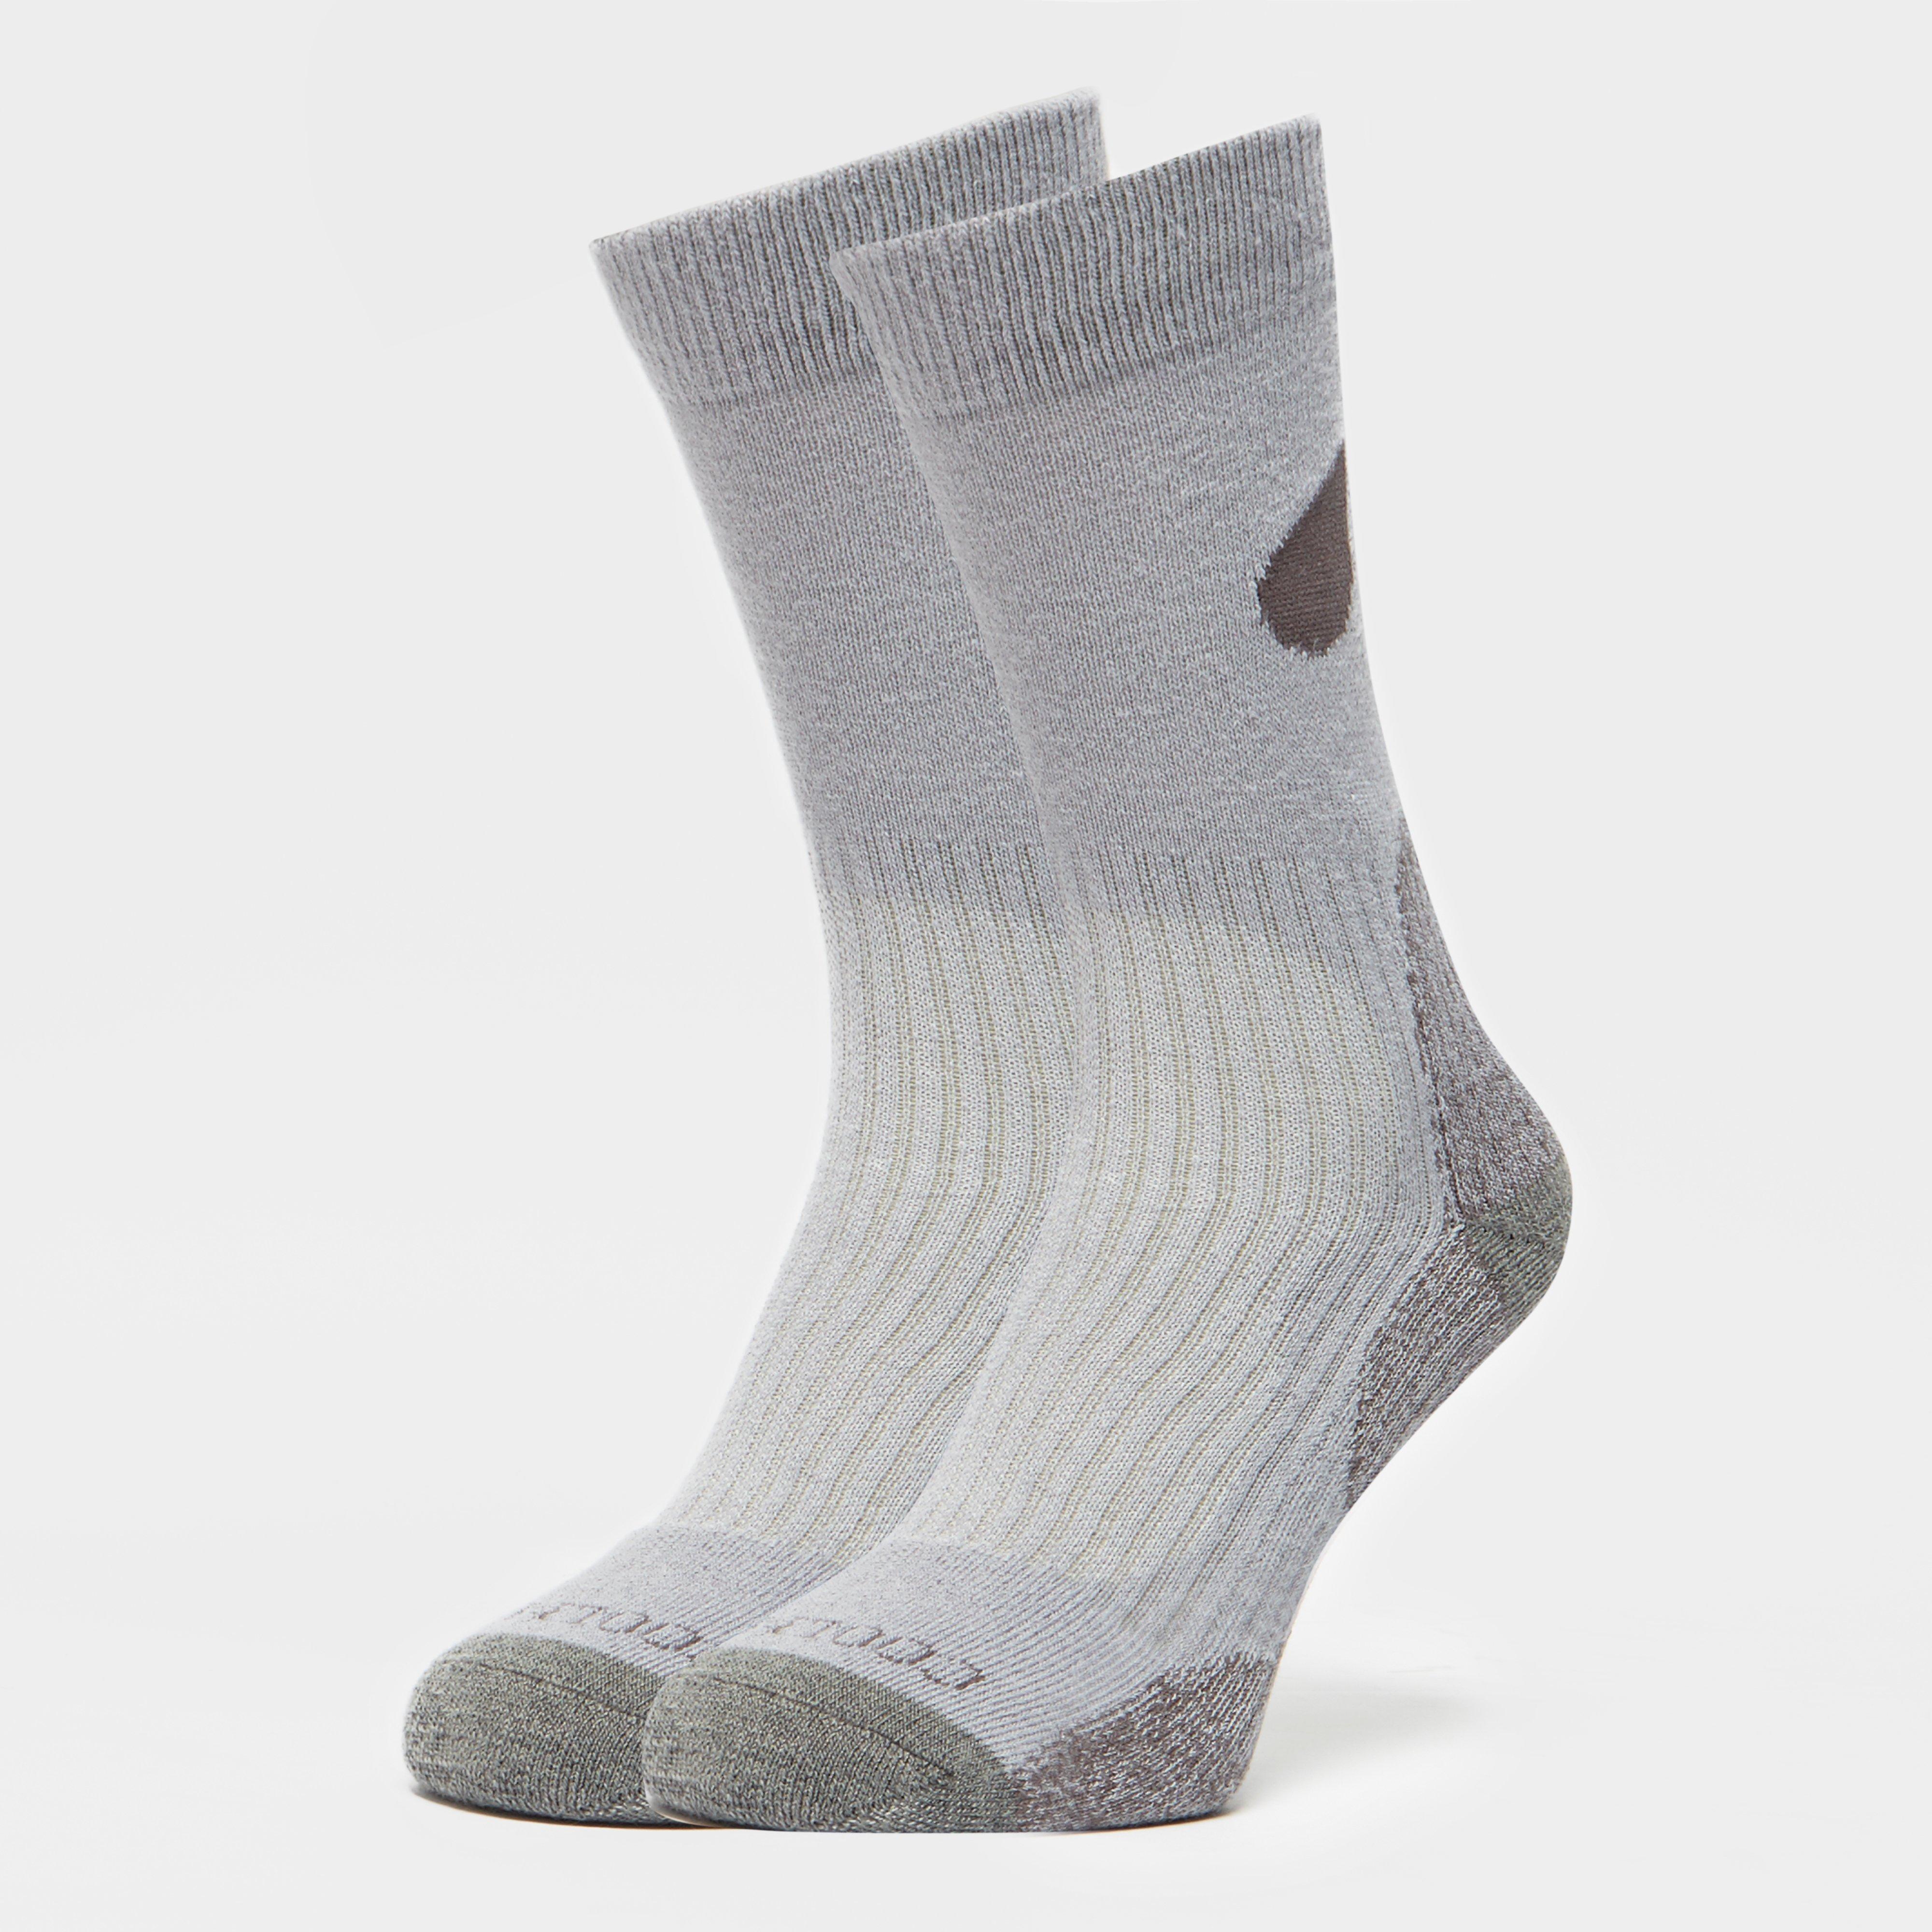 New Peter Storm Men's Lightweight Quick-Drying Socks